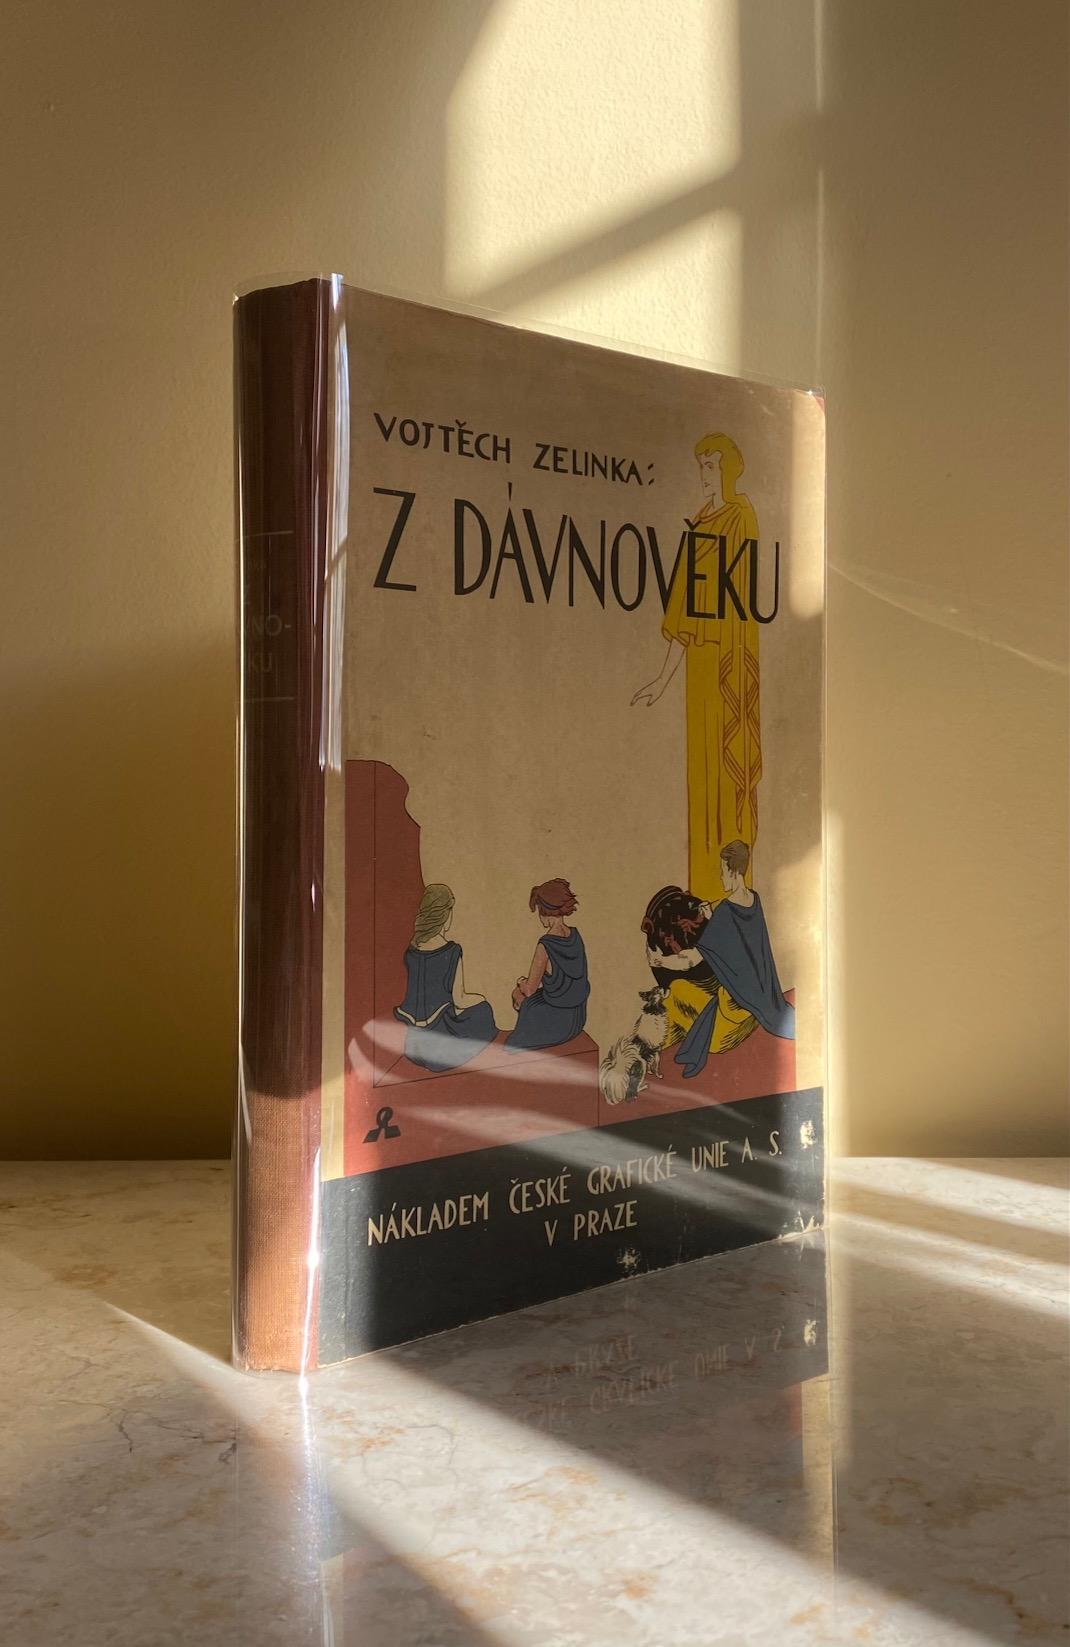 ZELINKA, VOJTECH (1890-1963) SECONDARY SCHOOL PROFESSOR, PRODUCED PUBLICATIONS IN THE FIELD OF LITERARY HISTORY AND SCHOOL LITERARY MANUALS. [ILLUSTRATED BY PROKOP LAICHTER] - Z Dávnoveku | Vypravuje (From Dávnovek in Ancient Times)